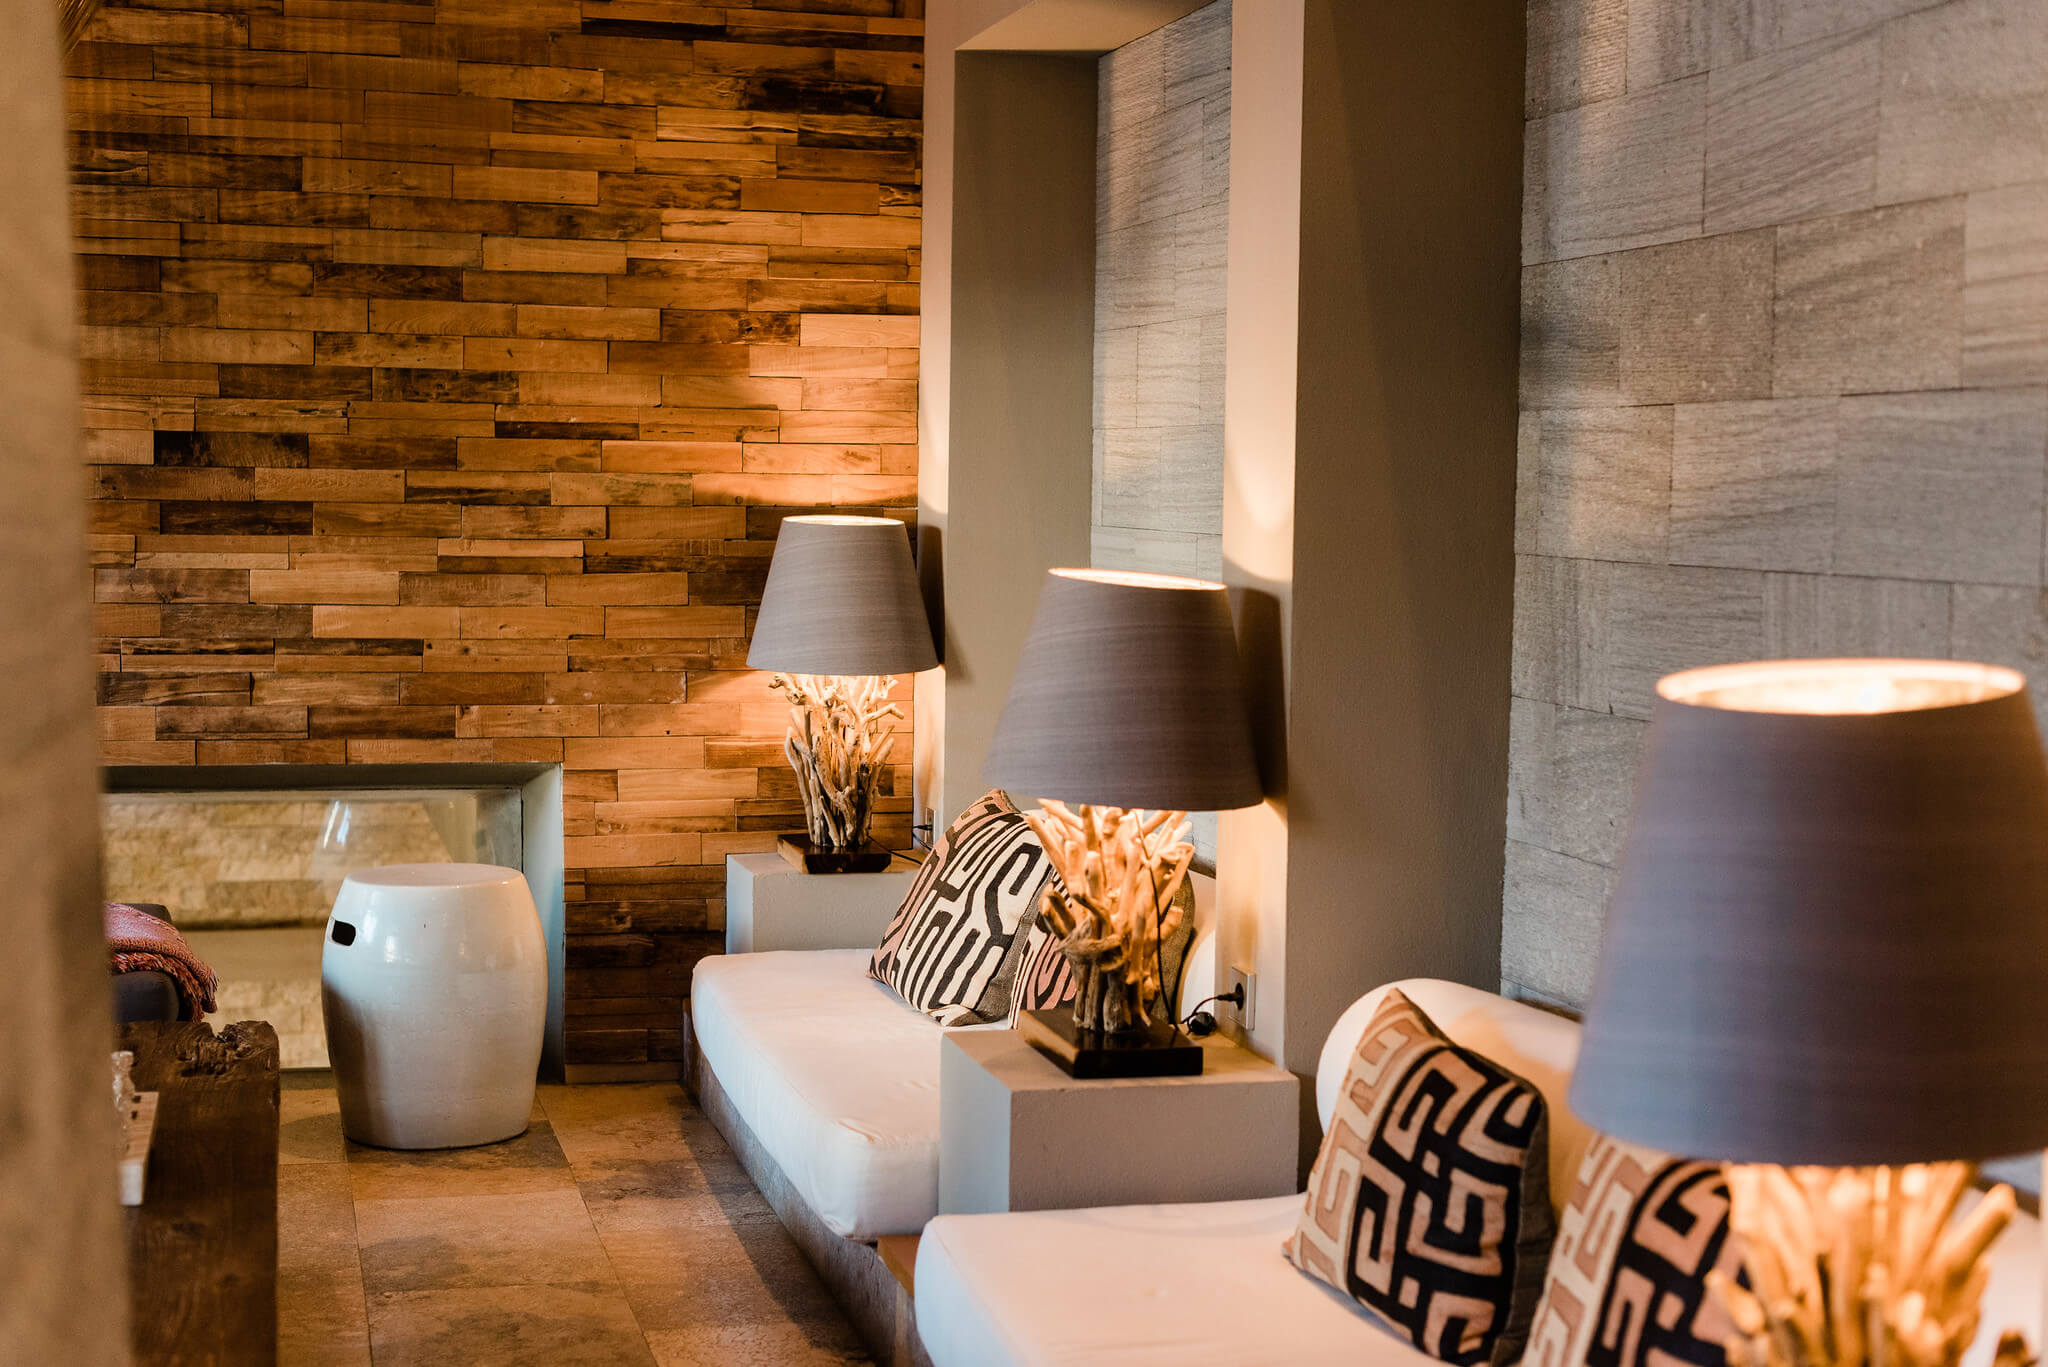 https://www.white-ibiza.com/wp-content/uploads/2020/03/white-ibiza-boutique-hotels-the-giri-residence-2020-08.jpg